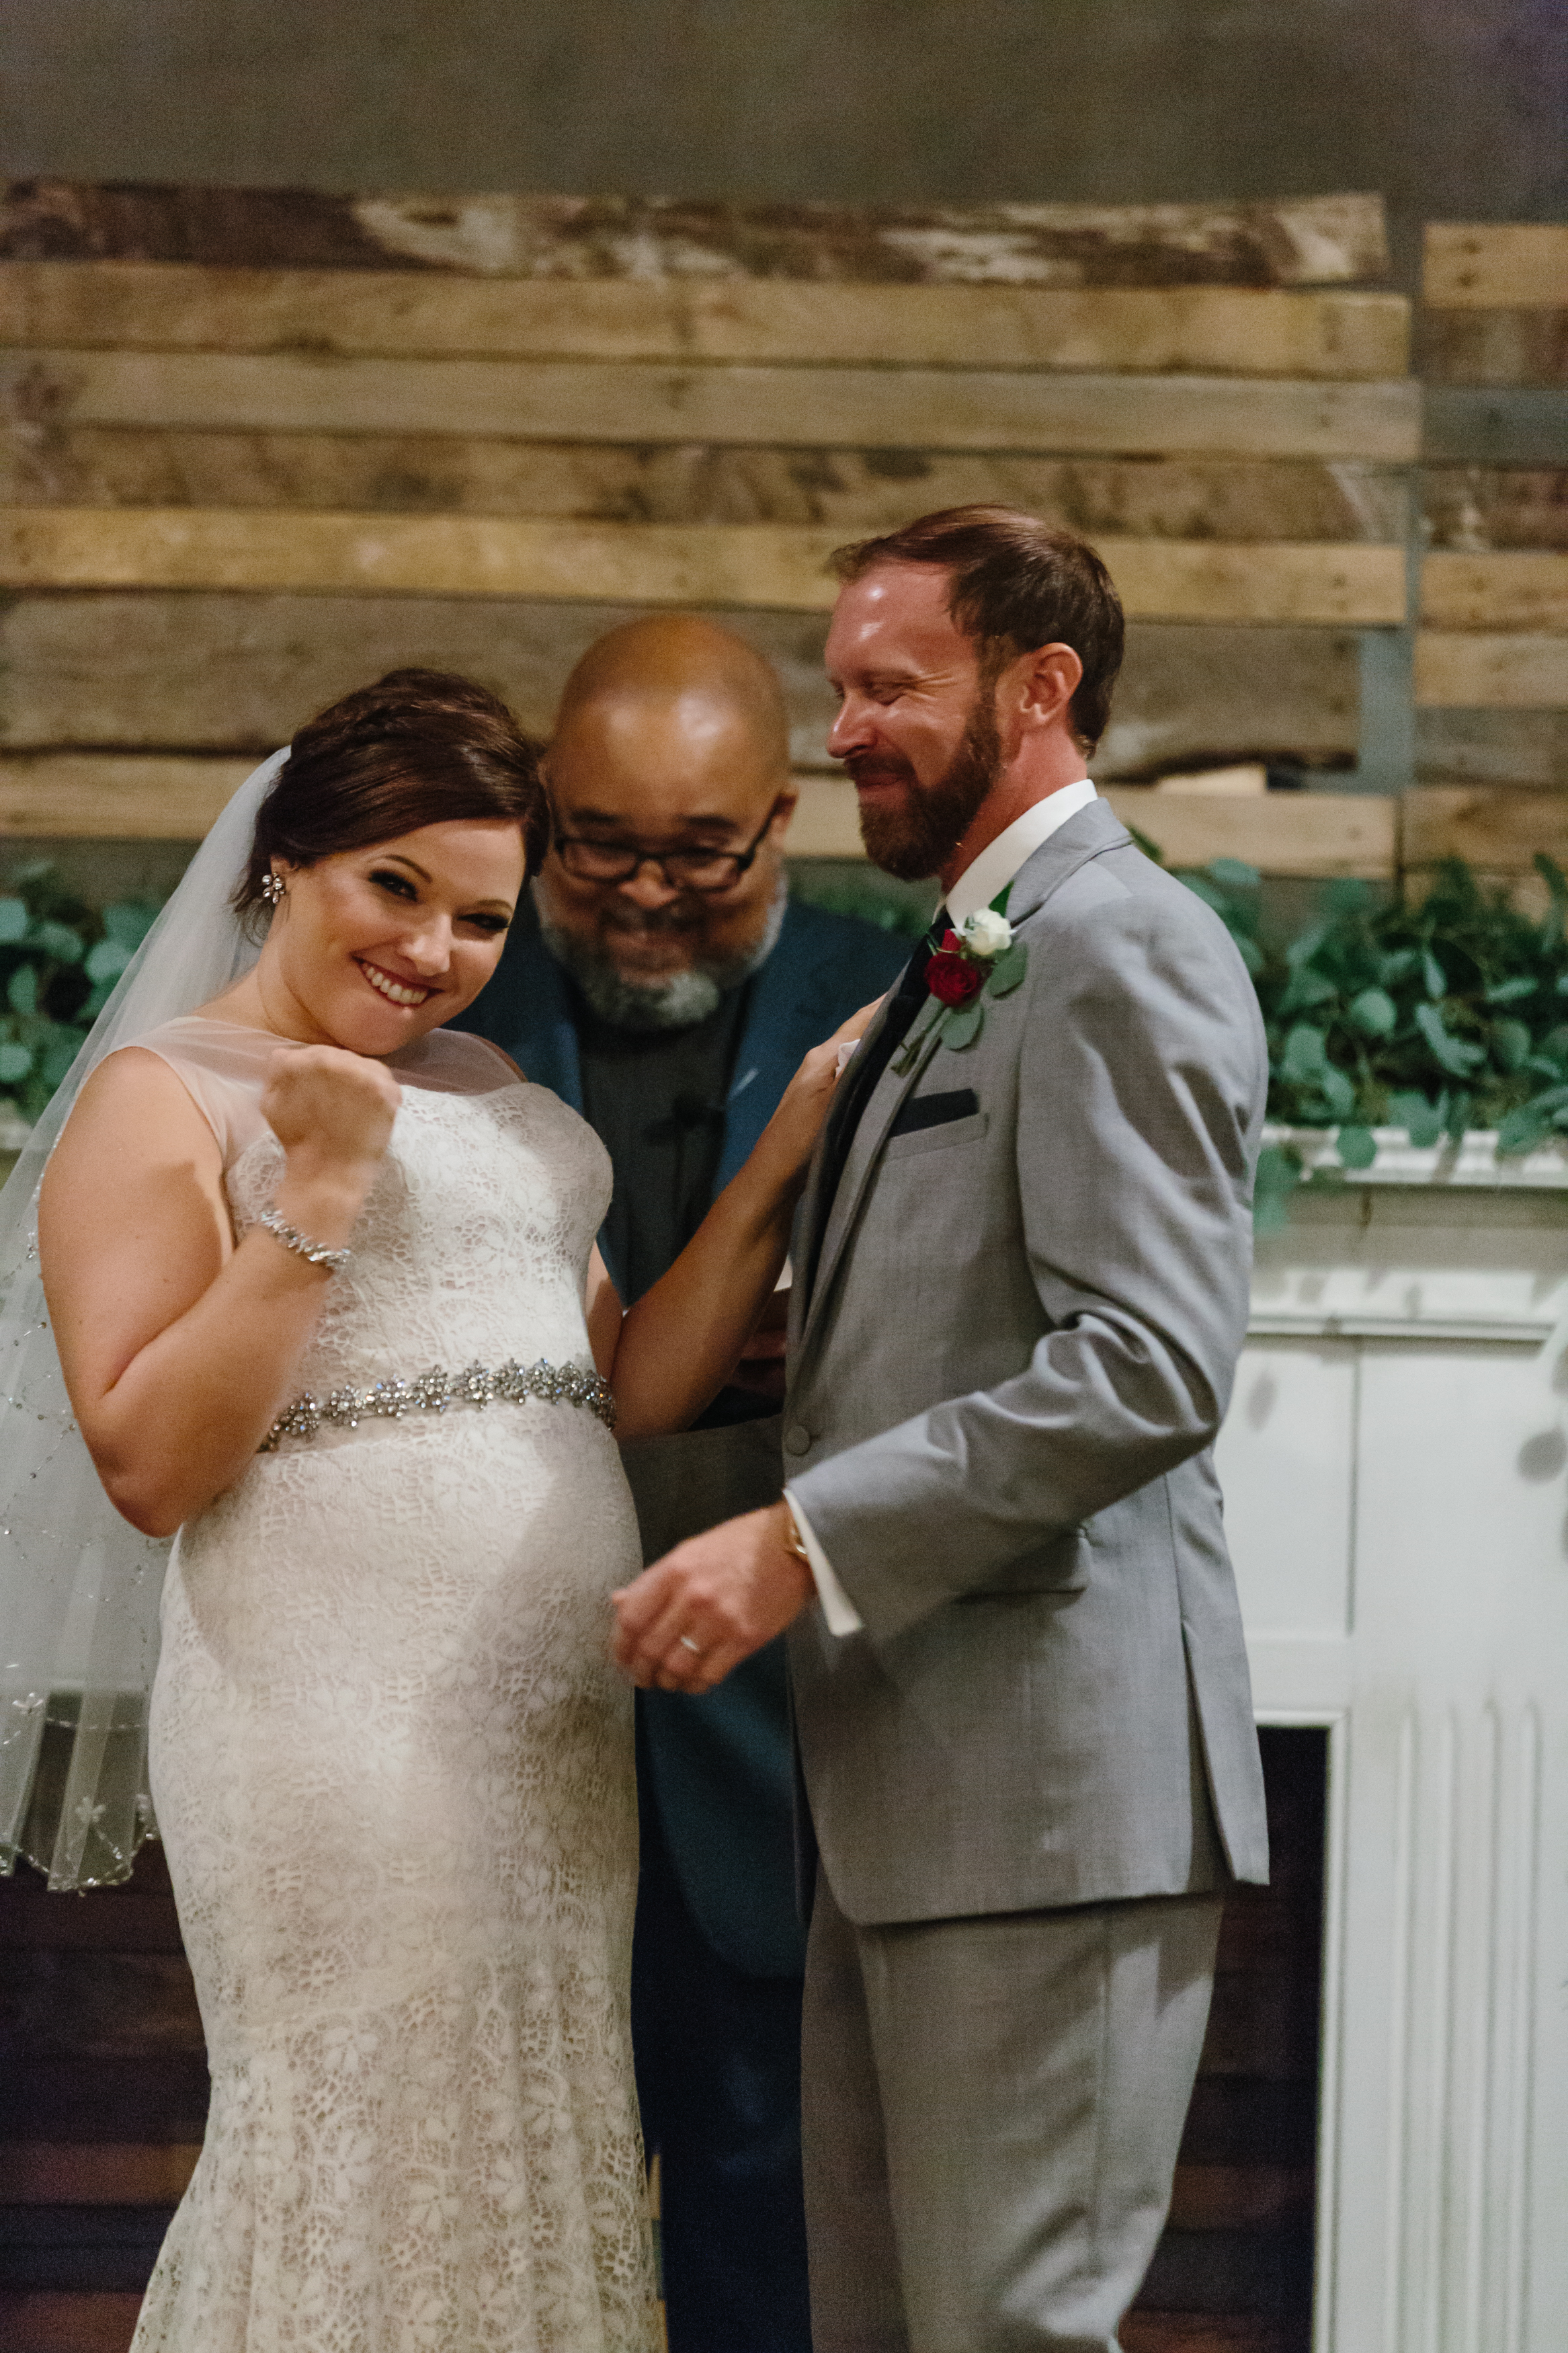 Jessica_Bryan_Wedding_Standard_Knoxville_Abigail_Malone_Photography-570.jpg